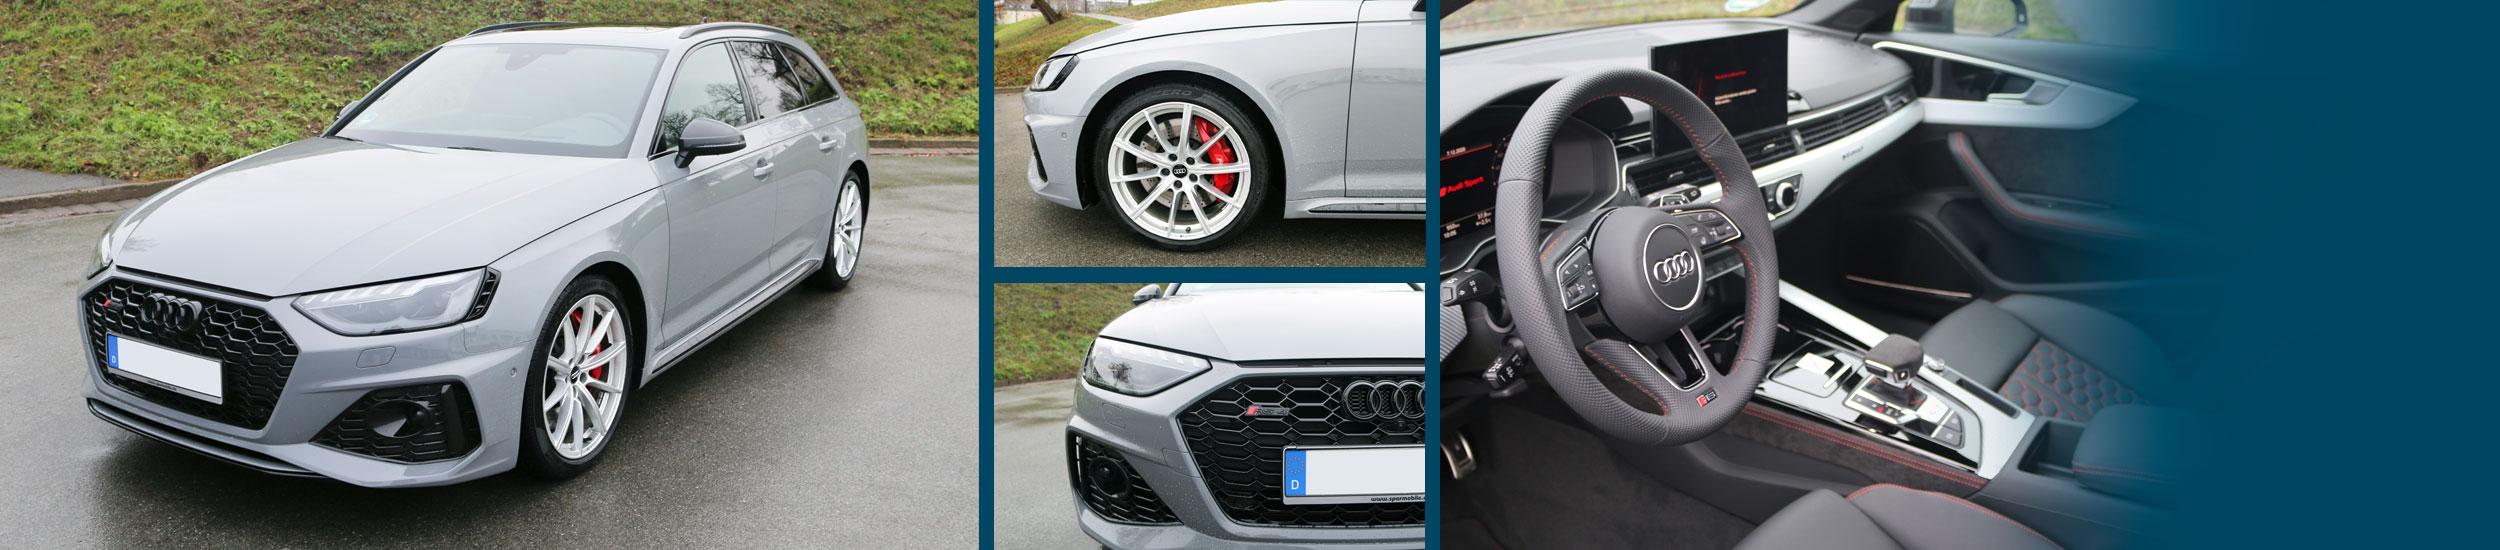 Sparmobile - AUDI RS4 AVANT Neu 2021